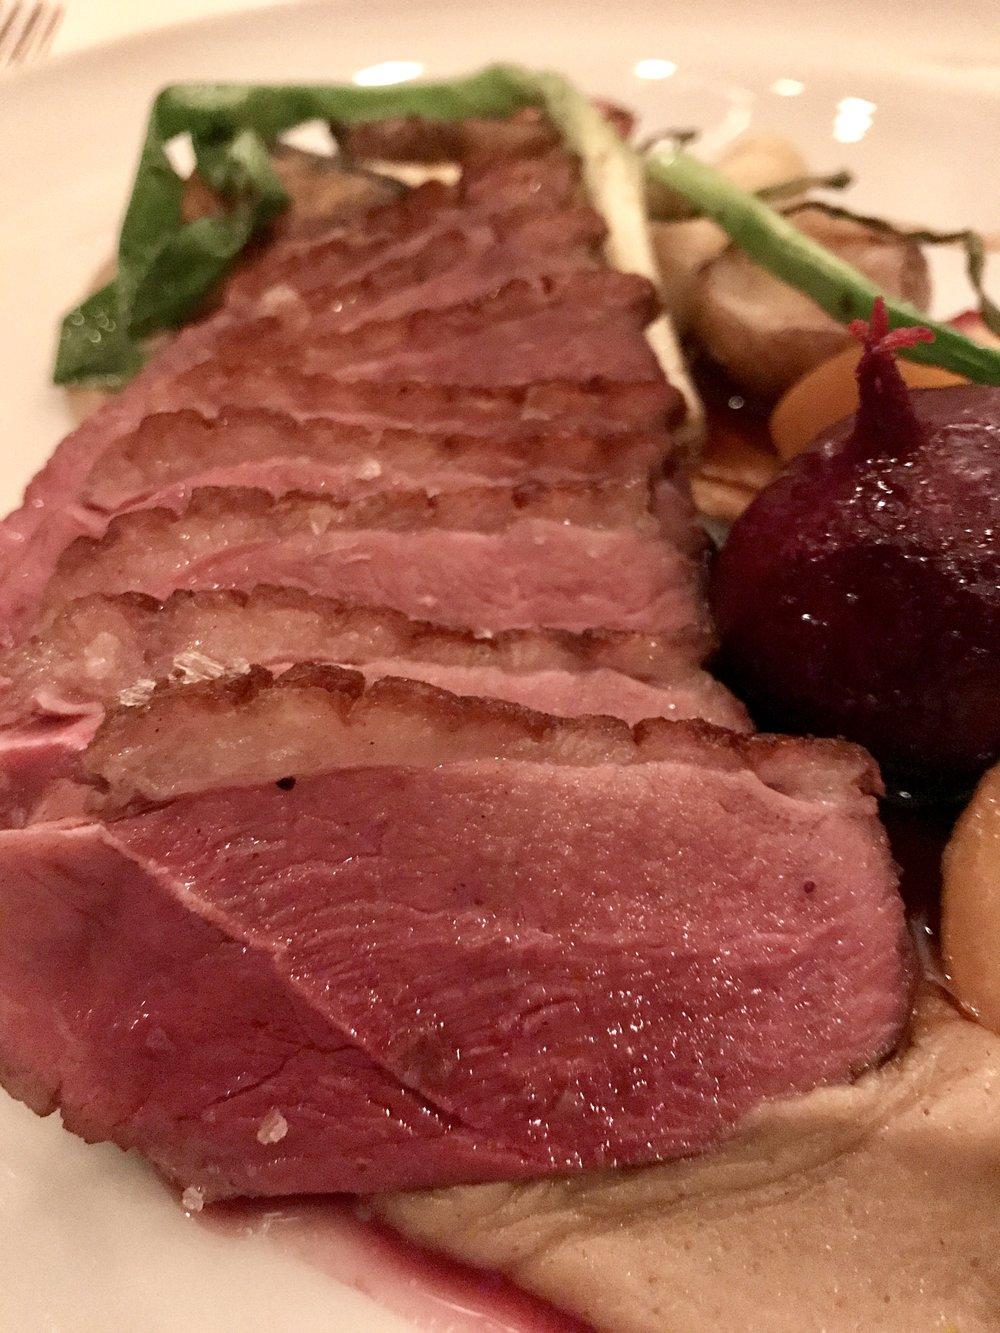 duck main dish menu st. john's newfoundland raymonds restaurant